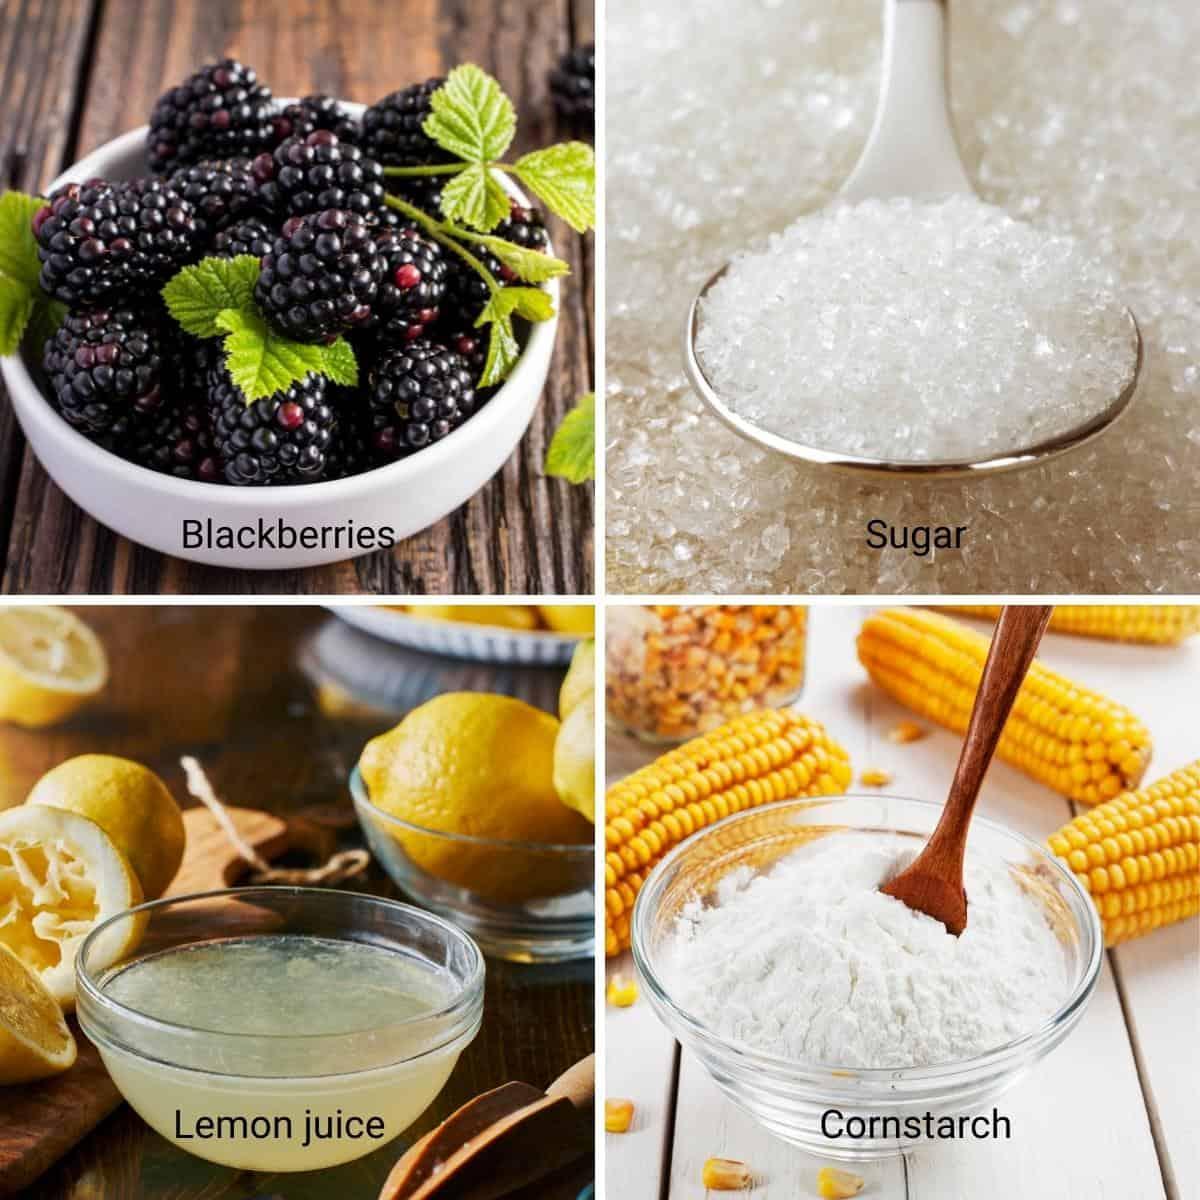 Ingredients shot collage for blackberry fruit fillings.